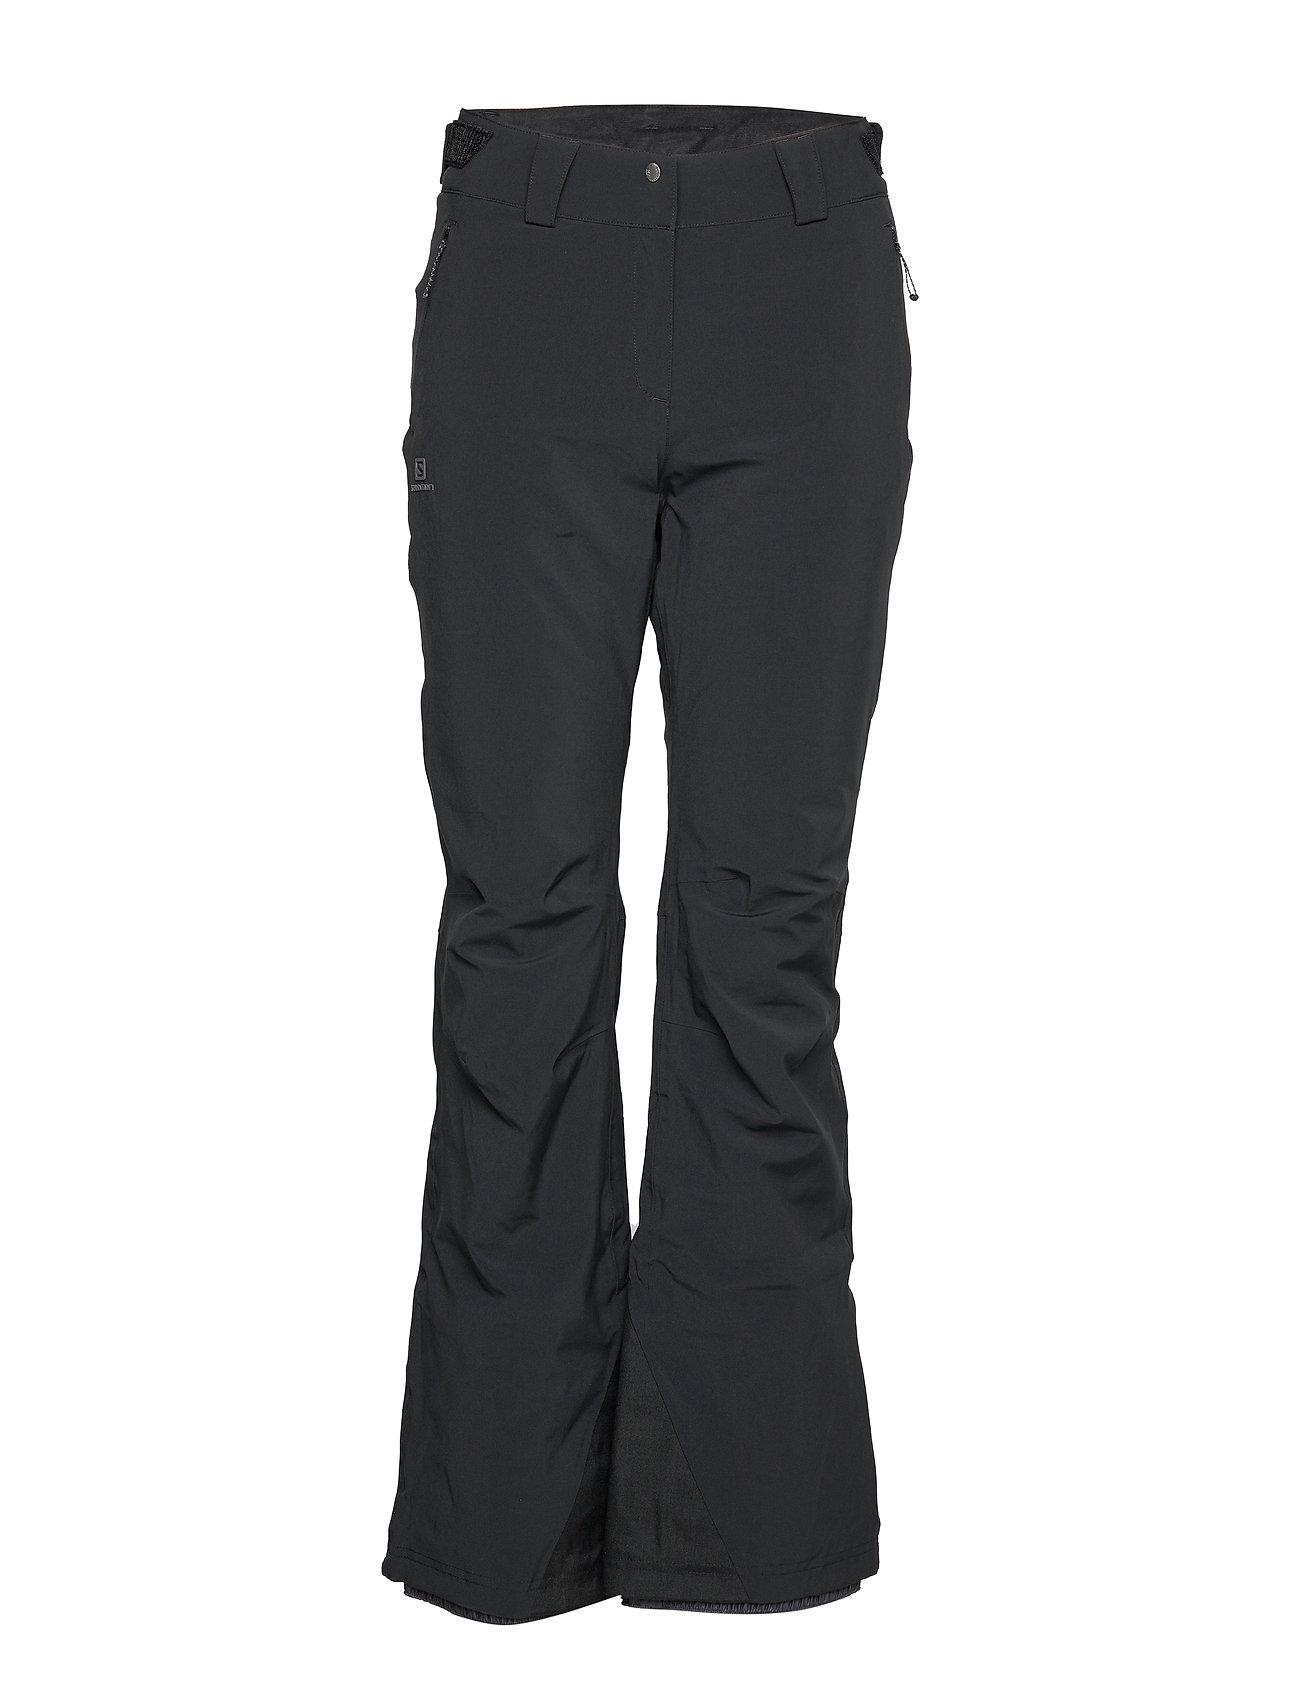 Image of Icemania Pant W Sport Pants Sort Salomon (3236599247)